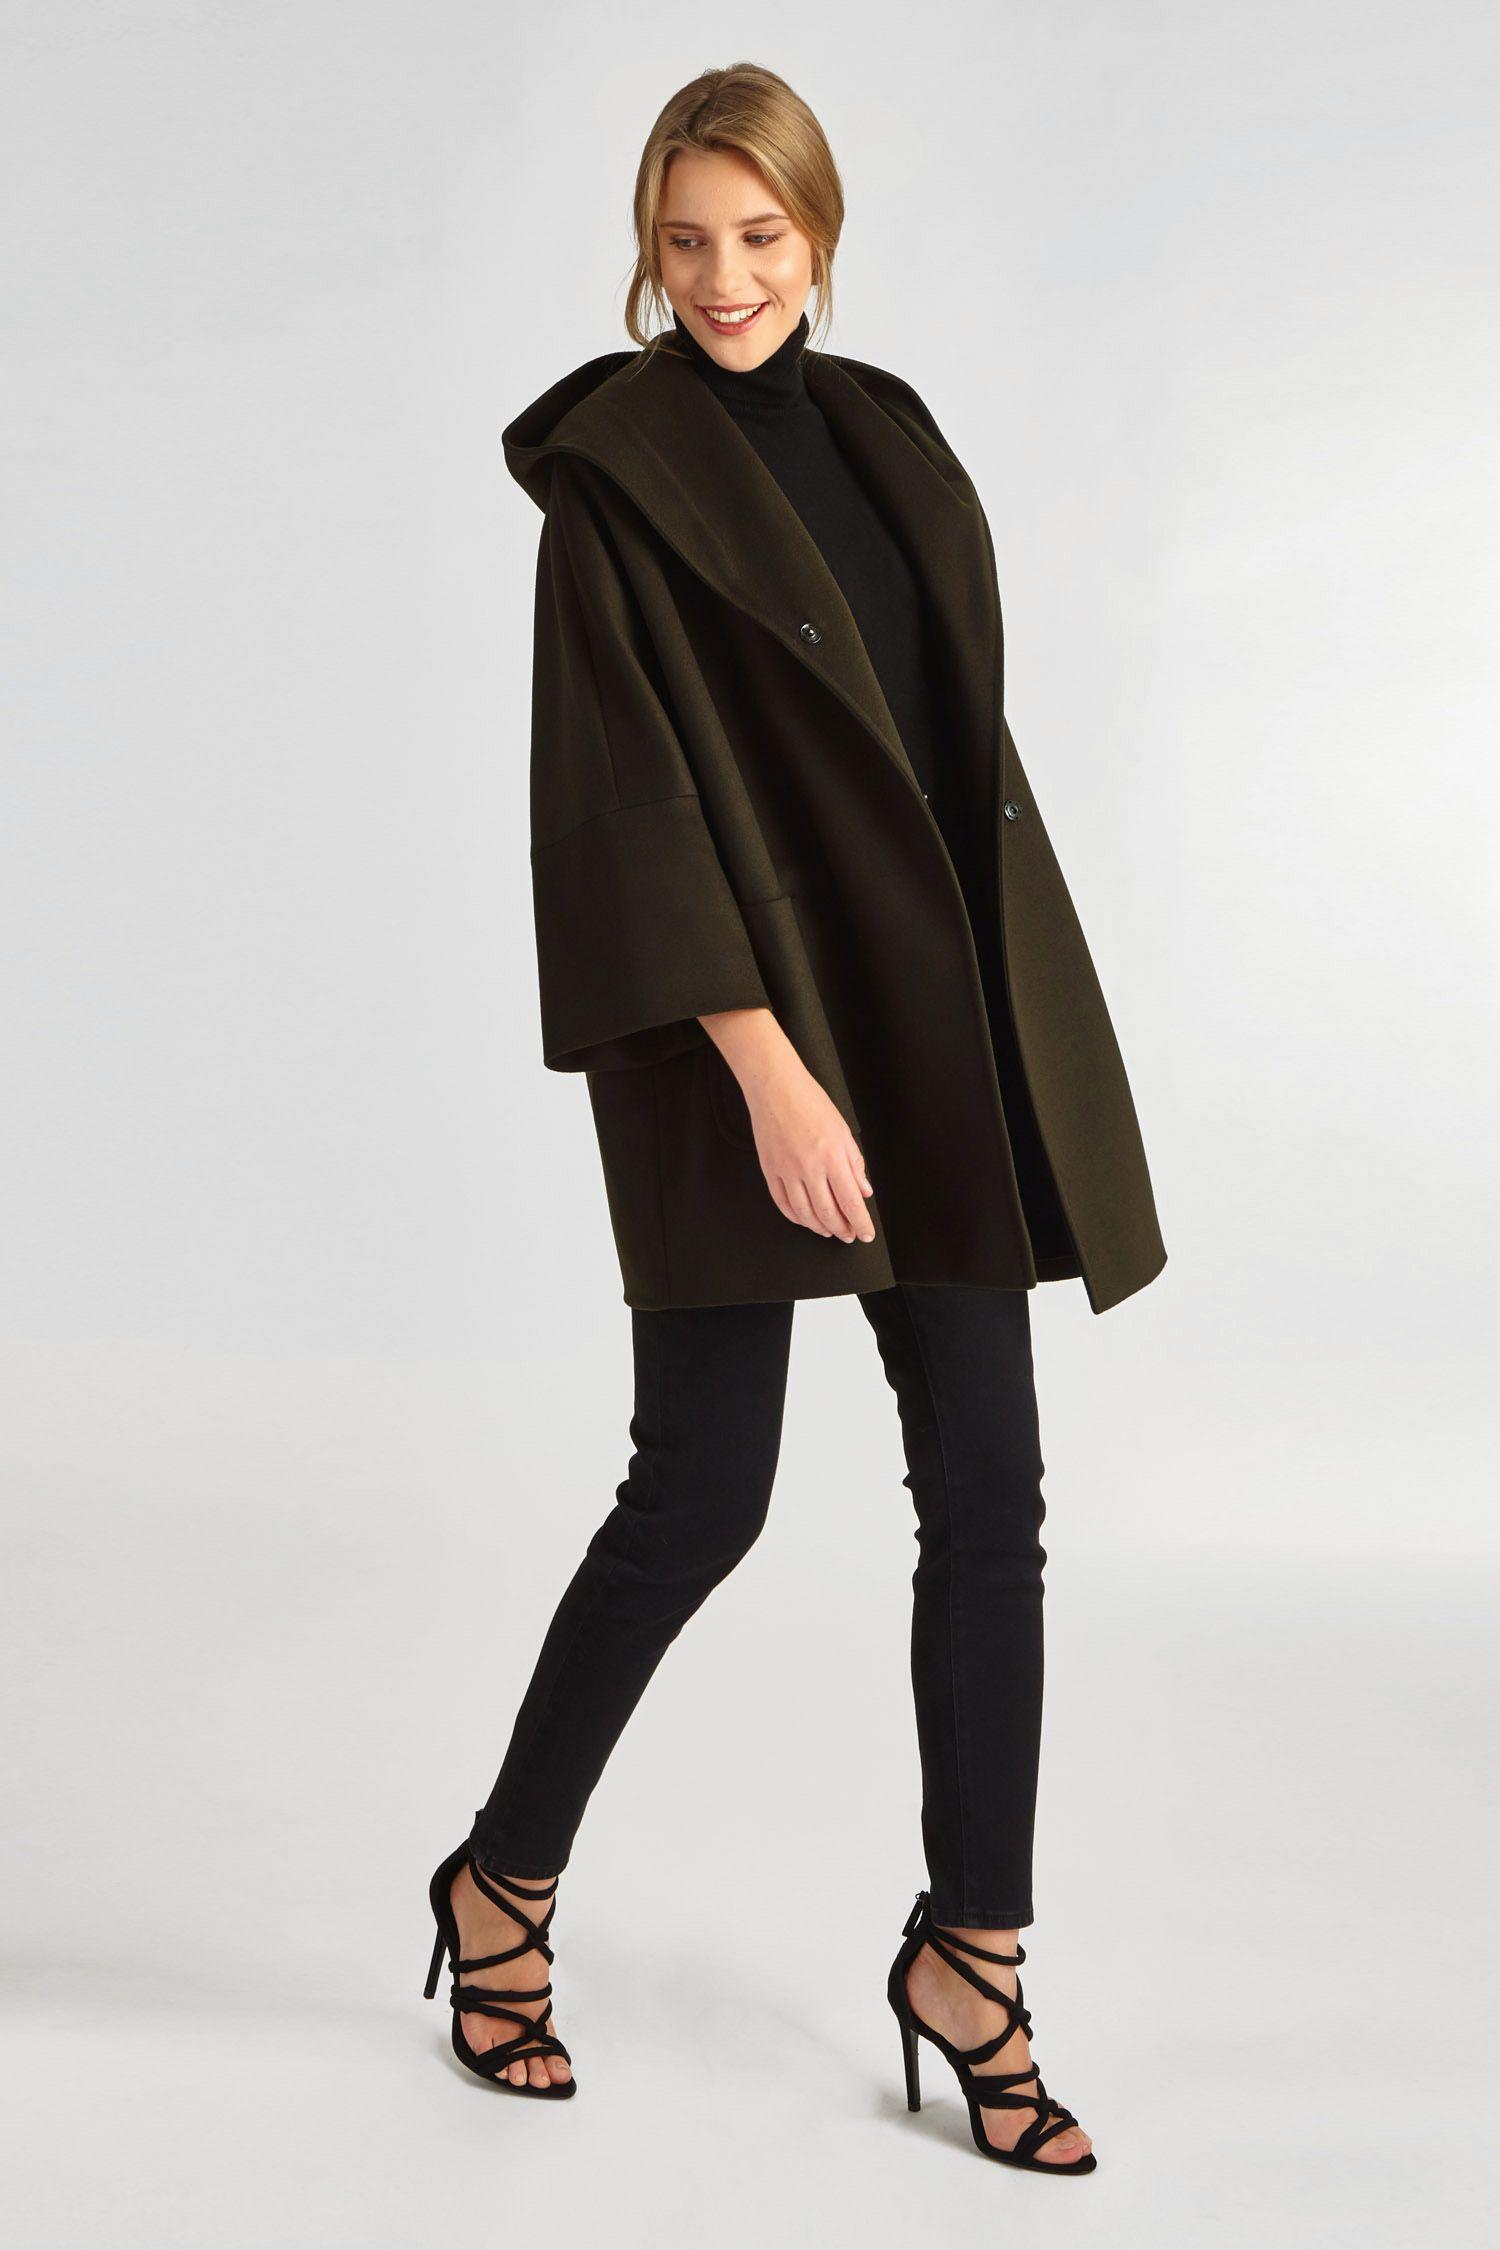 Kaban Kaban Manto Tuzun Turkiye Nin En Iyi Kadin Giyim Markasi Kadin Giyim Moda Stilleri Giyim